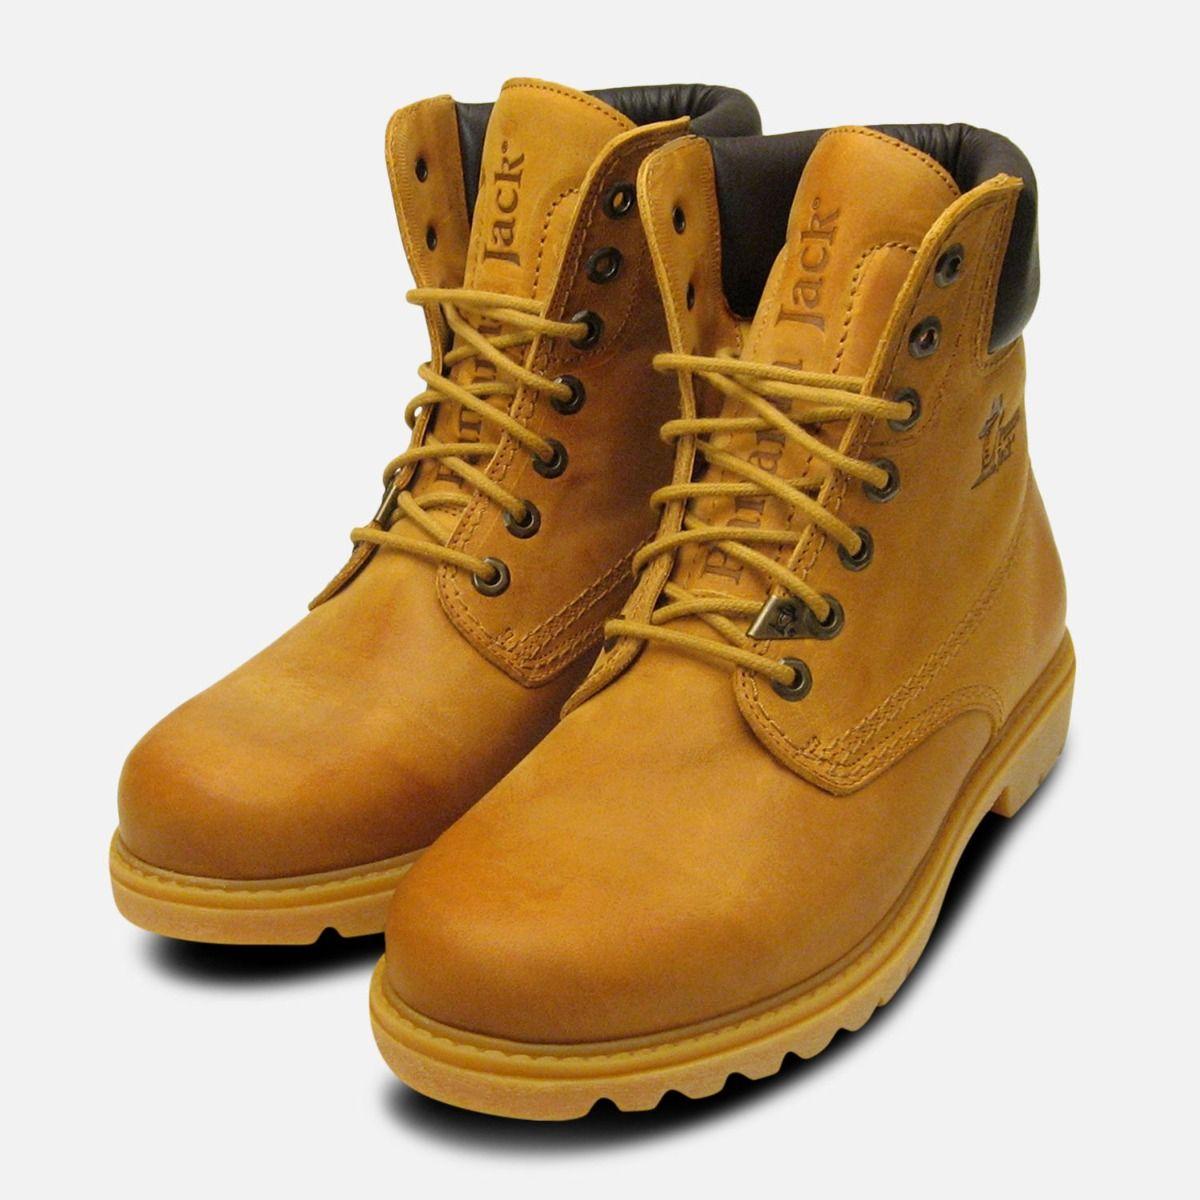 07e7bf96935627 Panama Jack Original Mens Napa Vintage Boots